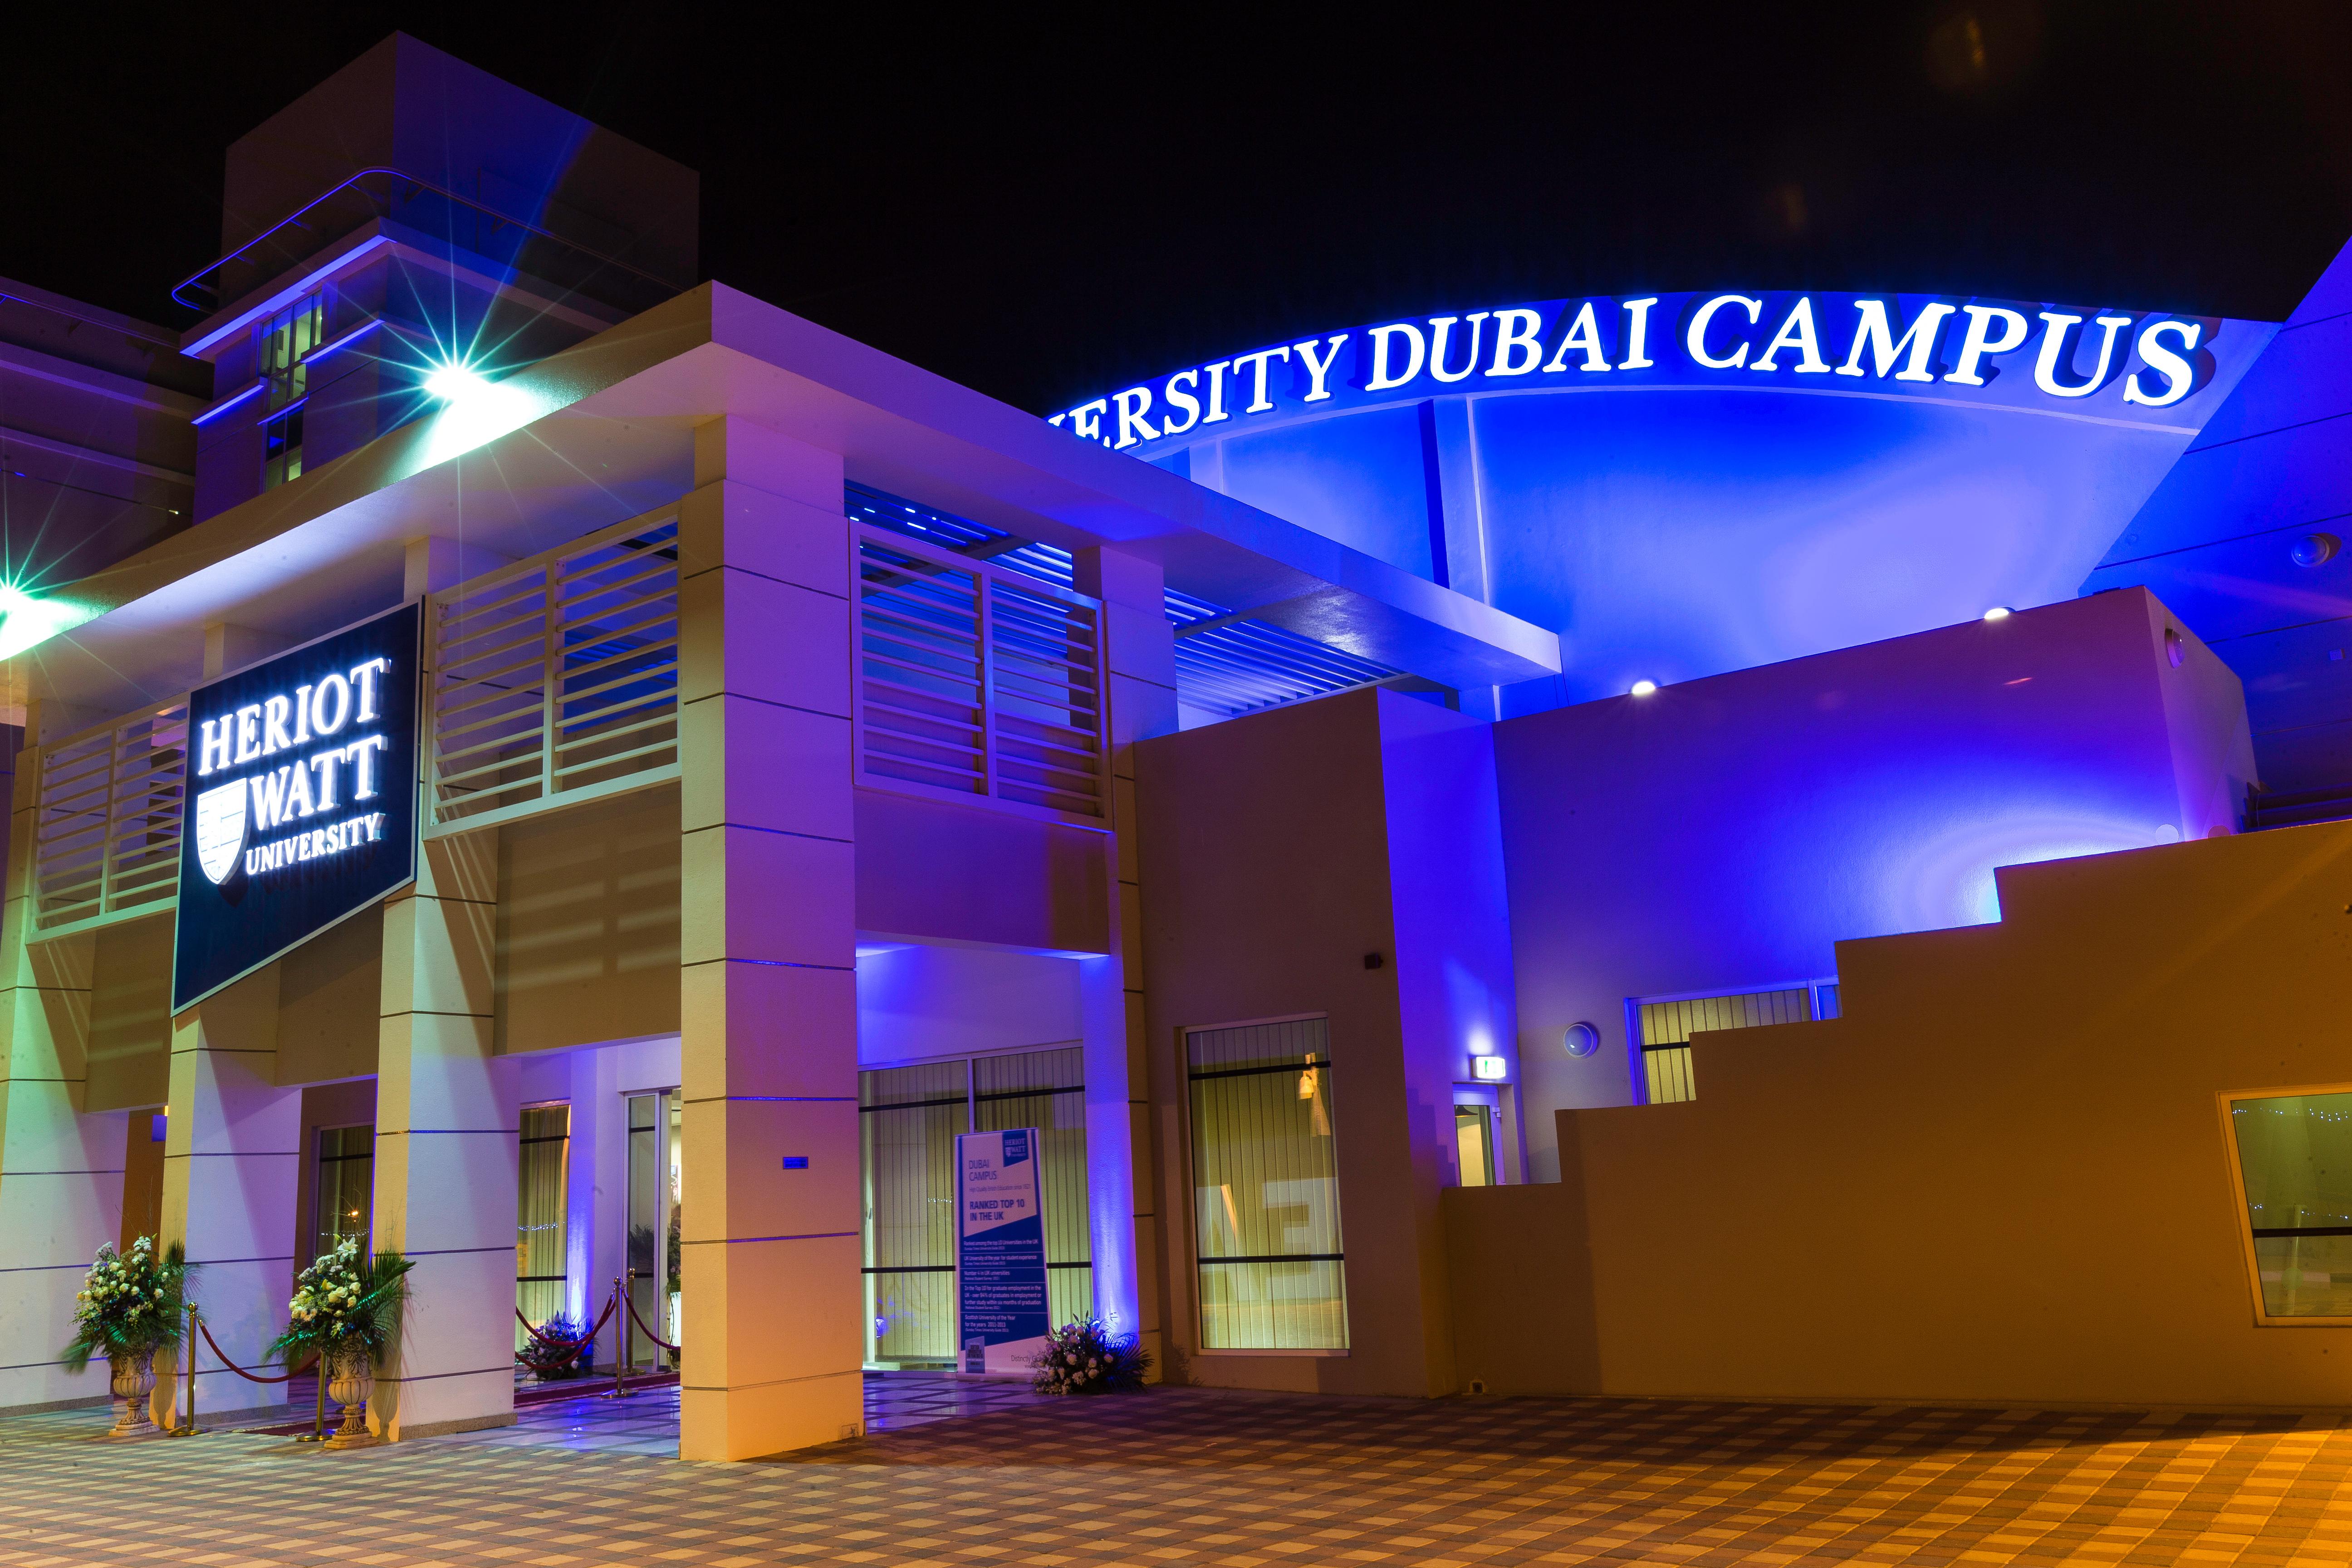 Heriot-Watt University Dubai - Its About Dubai